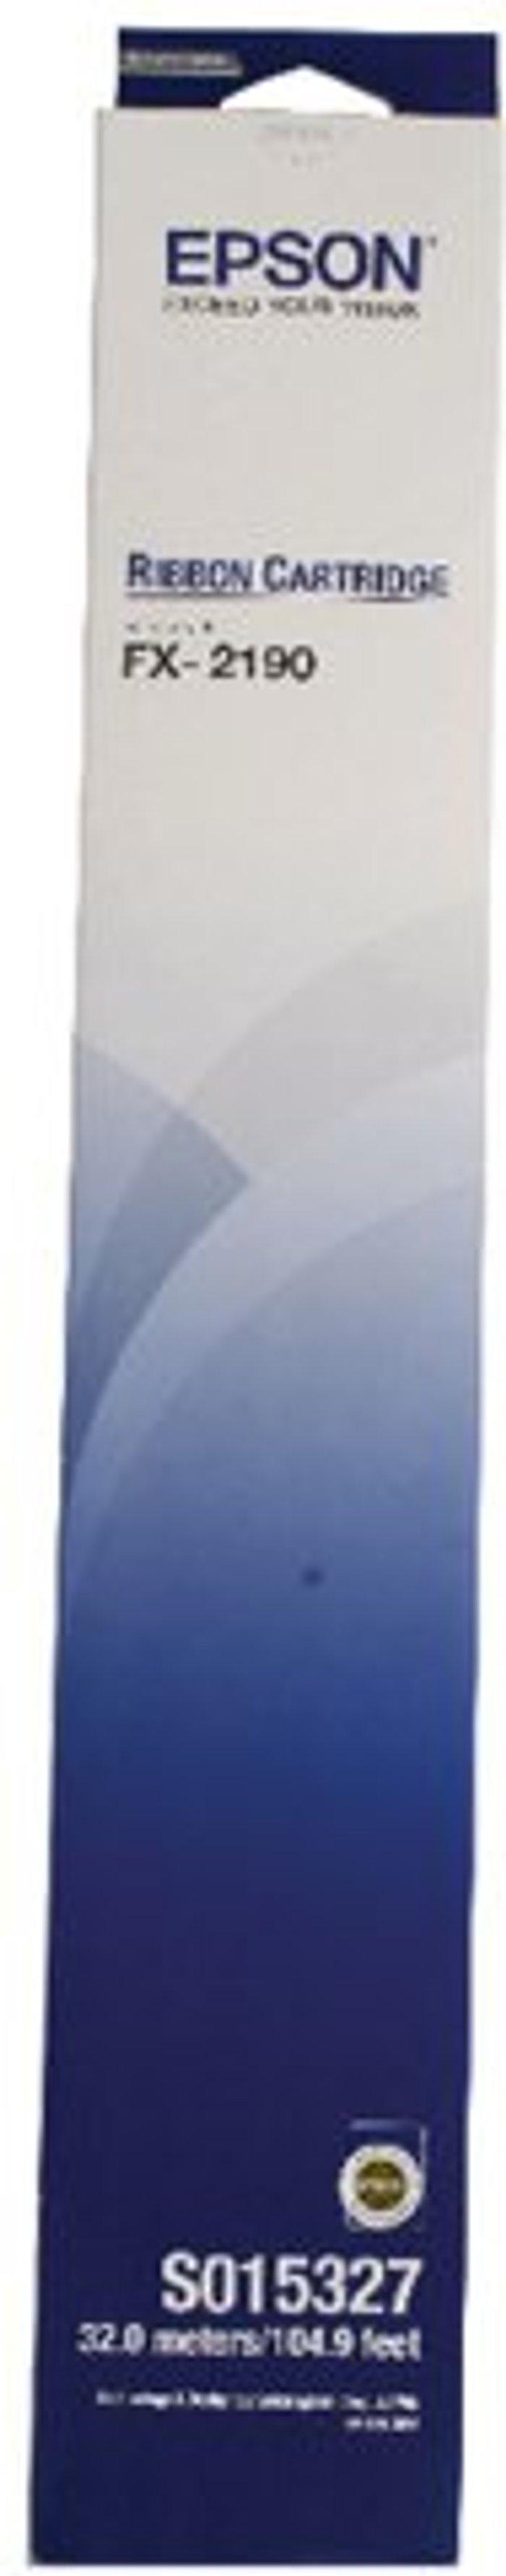 Epson Epson Fabric Ribbon Cartridge FX-2190 Black C13S015327